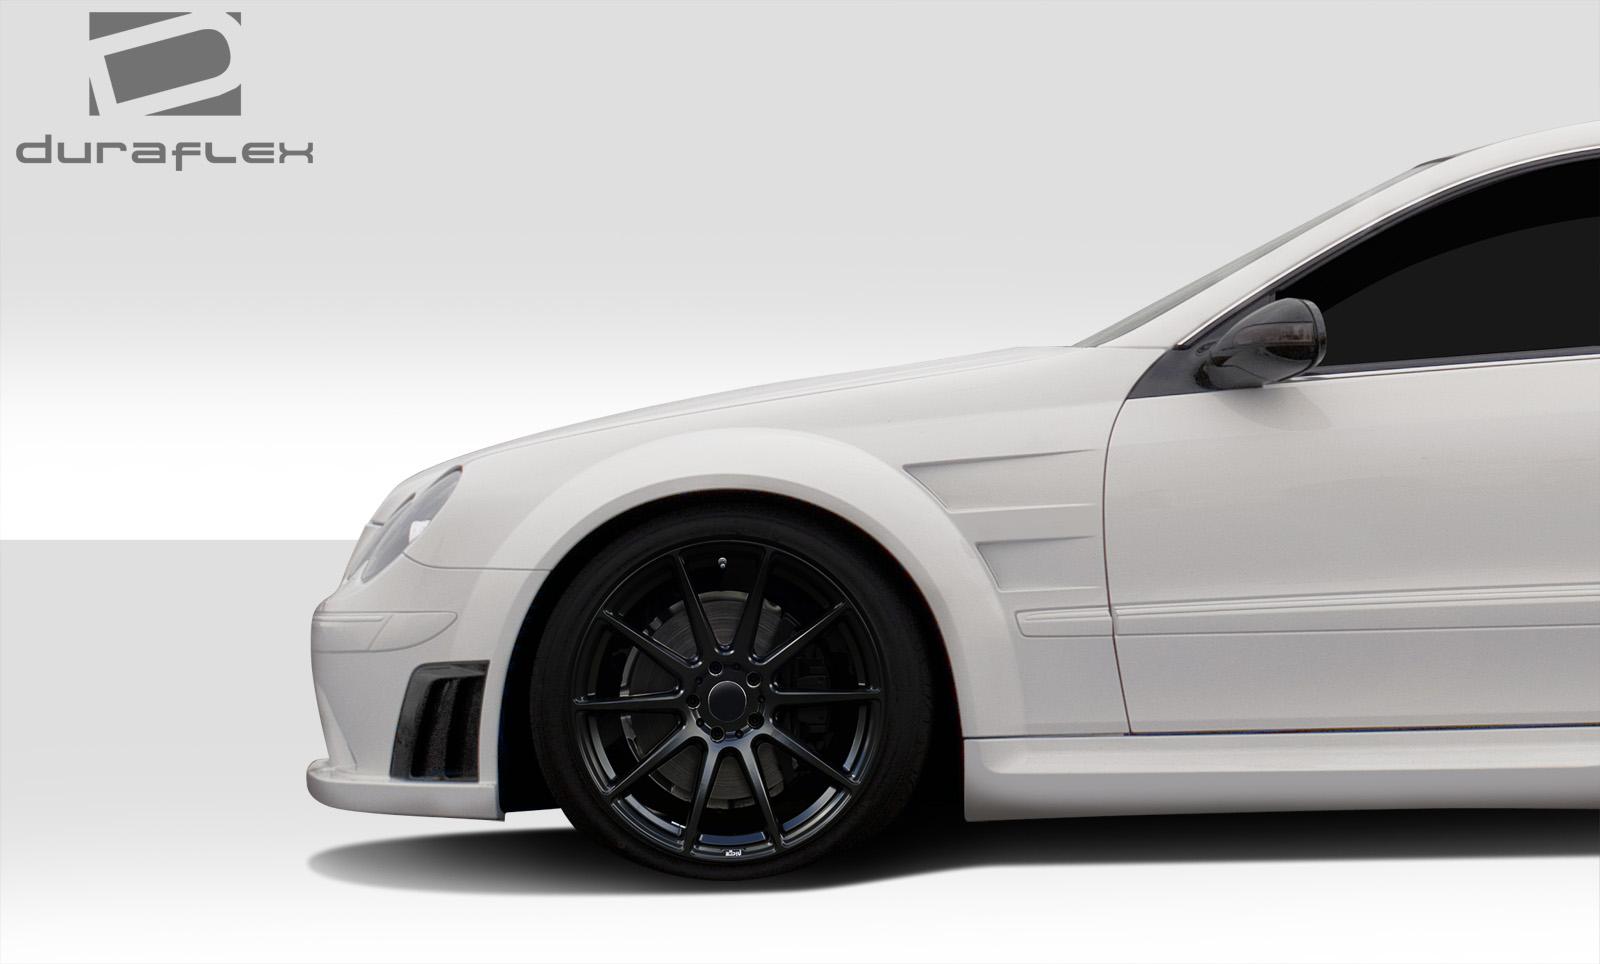 03 09 mercedes clk black series duraflex wide body kit for Mercedes benz clk black series body kit